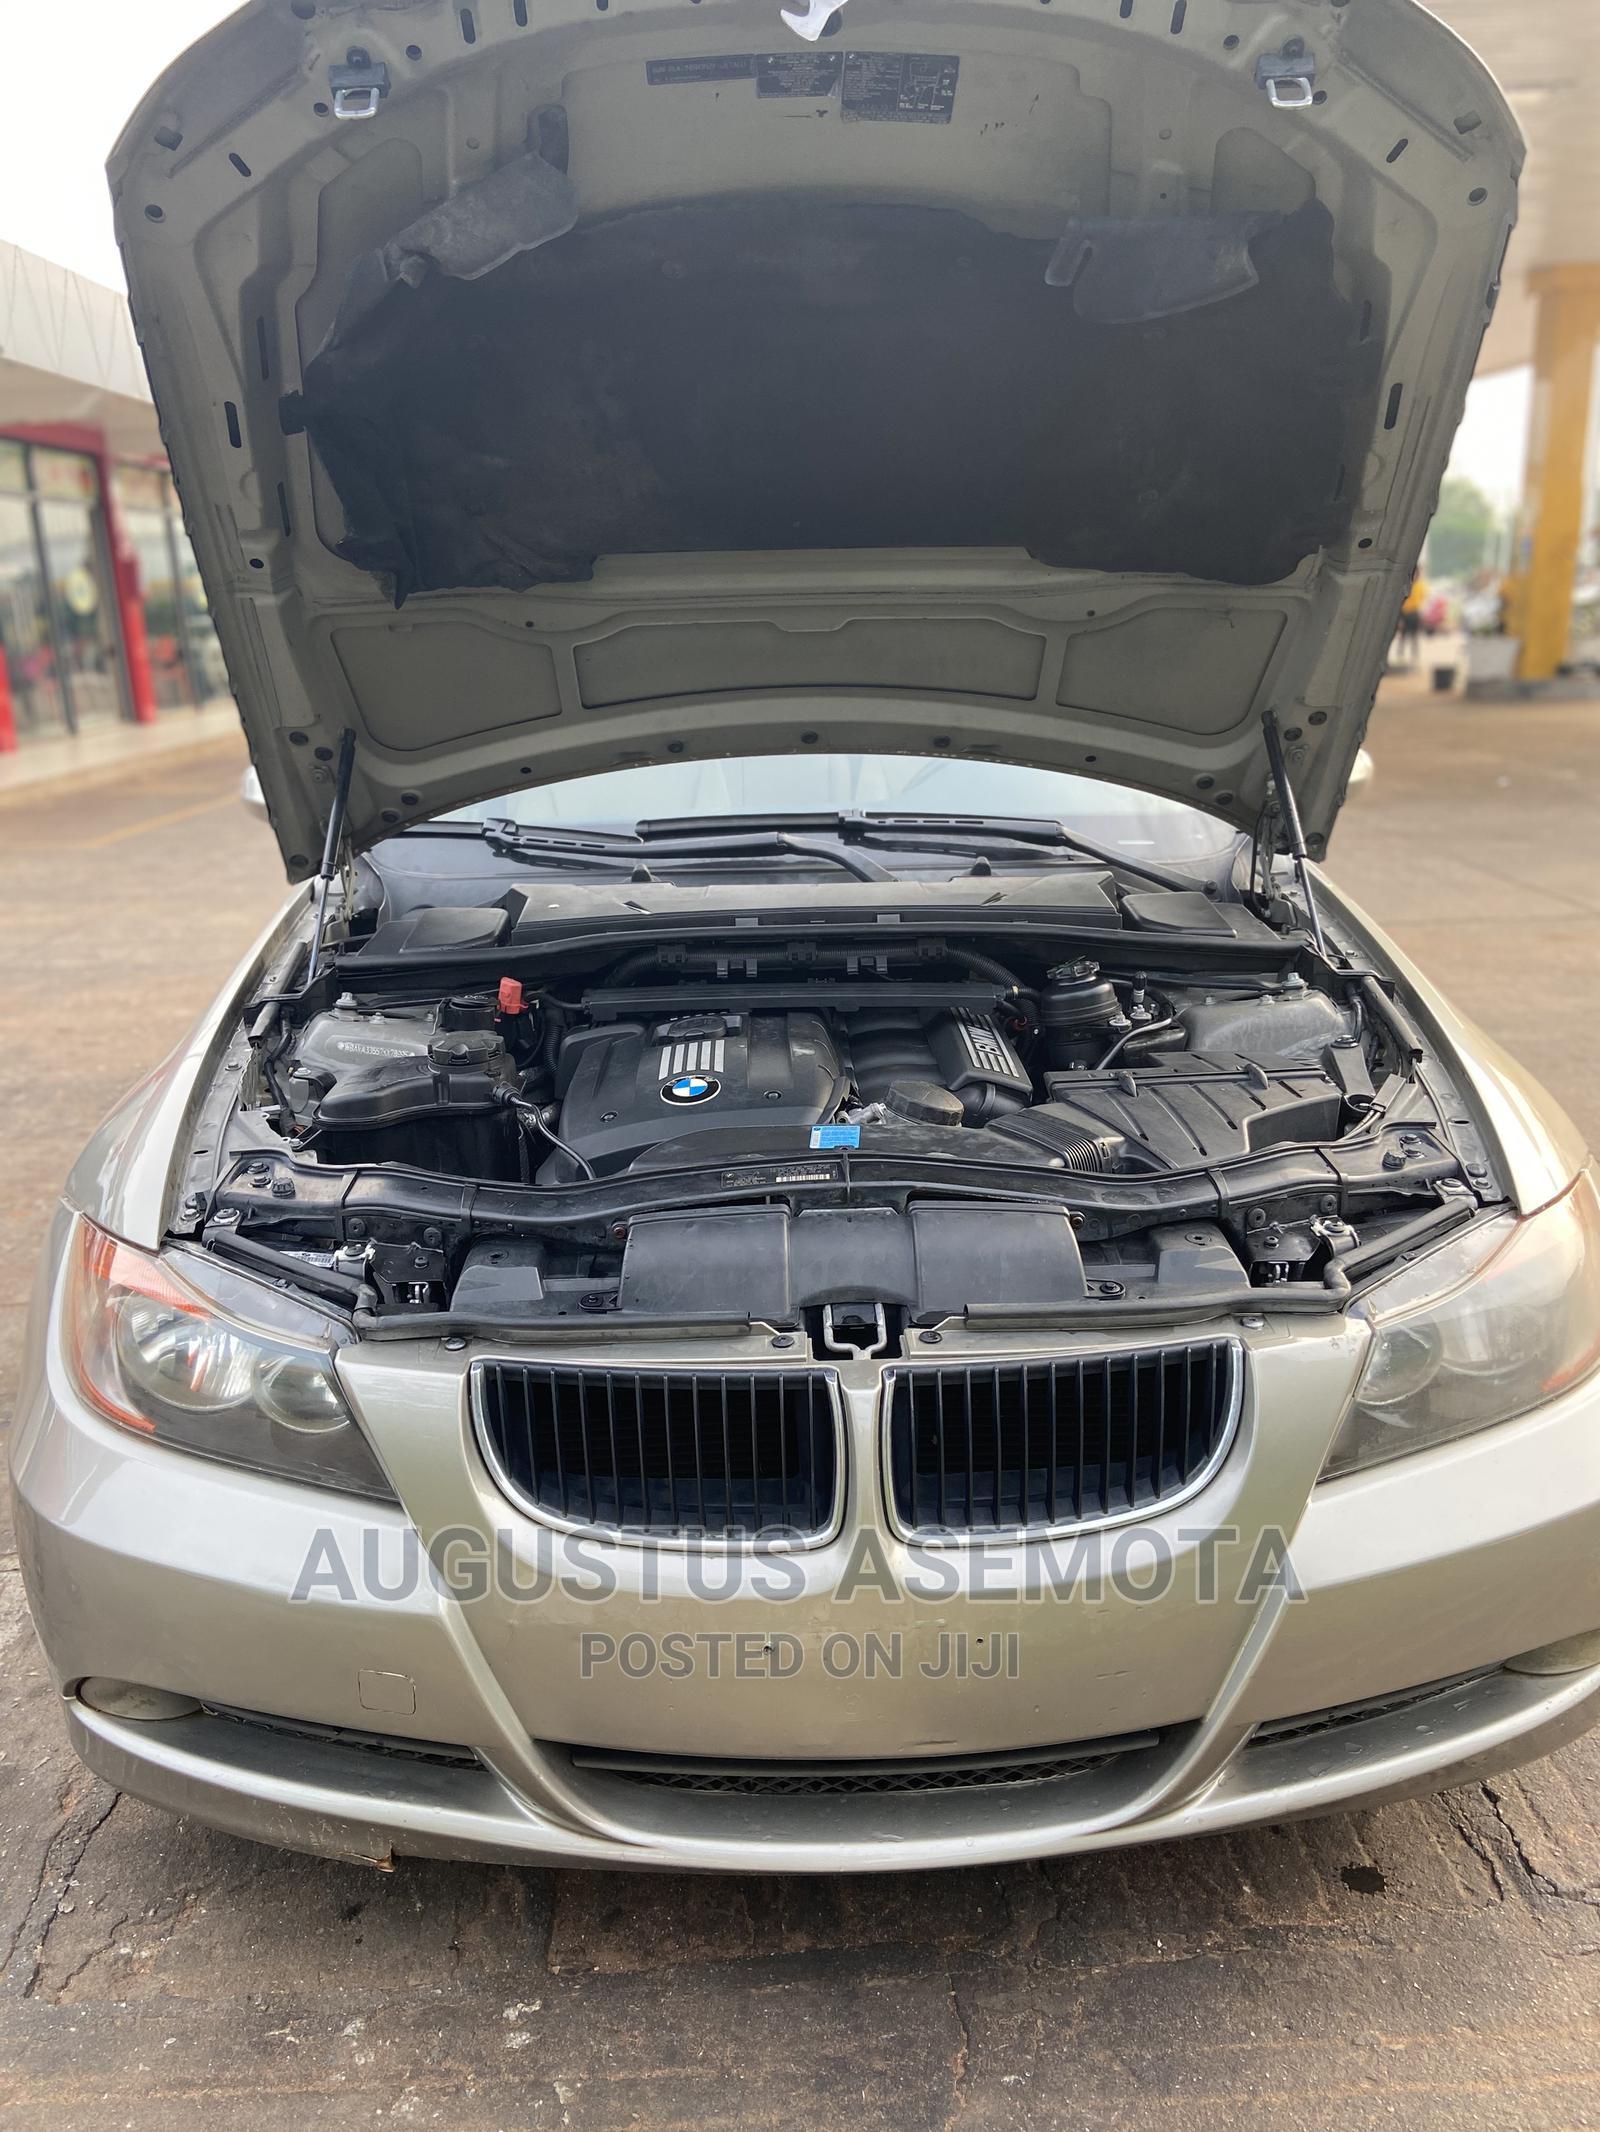 Archive: BMW 328i 2007 Silver